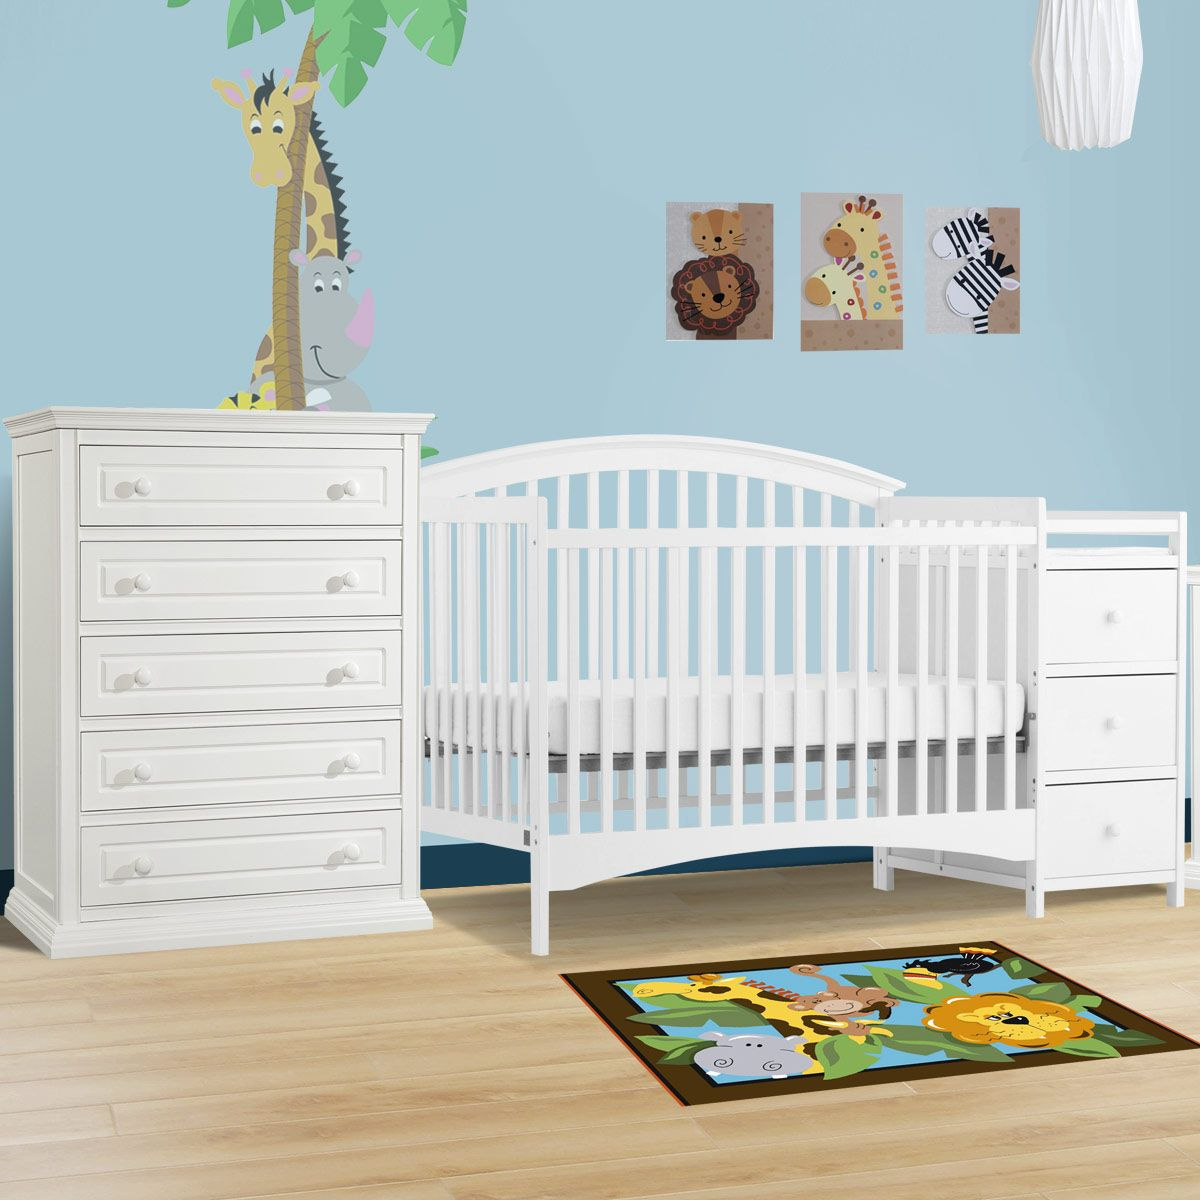 Storkcraft 2 Piece Nursery Set Bradford Convertible Crib And Concord 5 Drawer Dresser In White Free Shipping Nursery Set Cribs Convertible Crib [ 1200 x 1200 Pixel ]